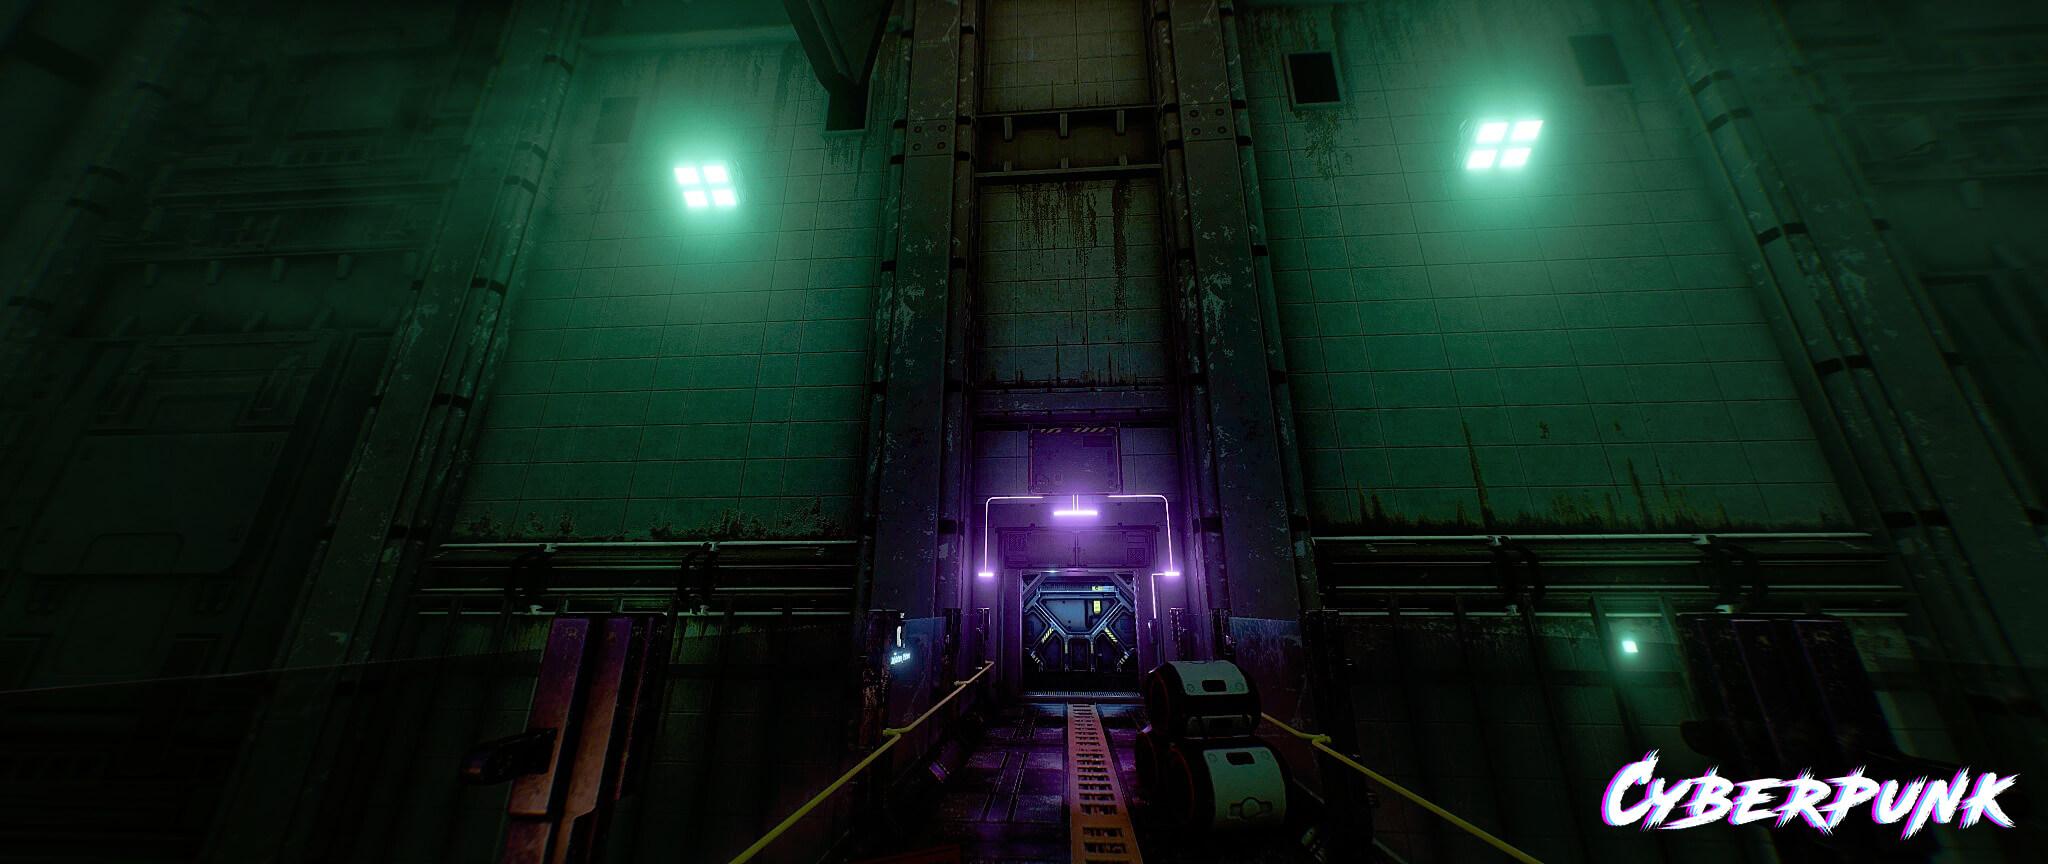 ER_Cyberpunk_3